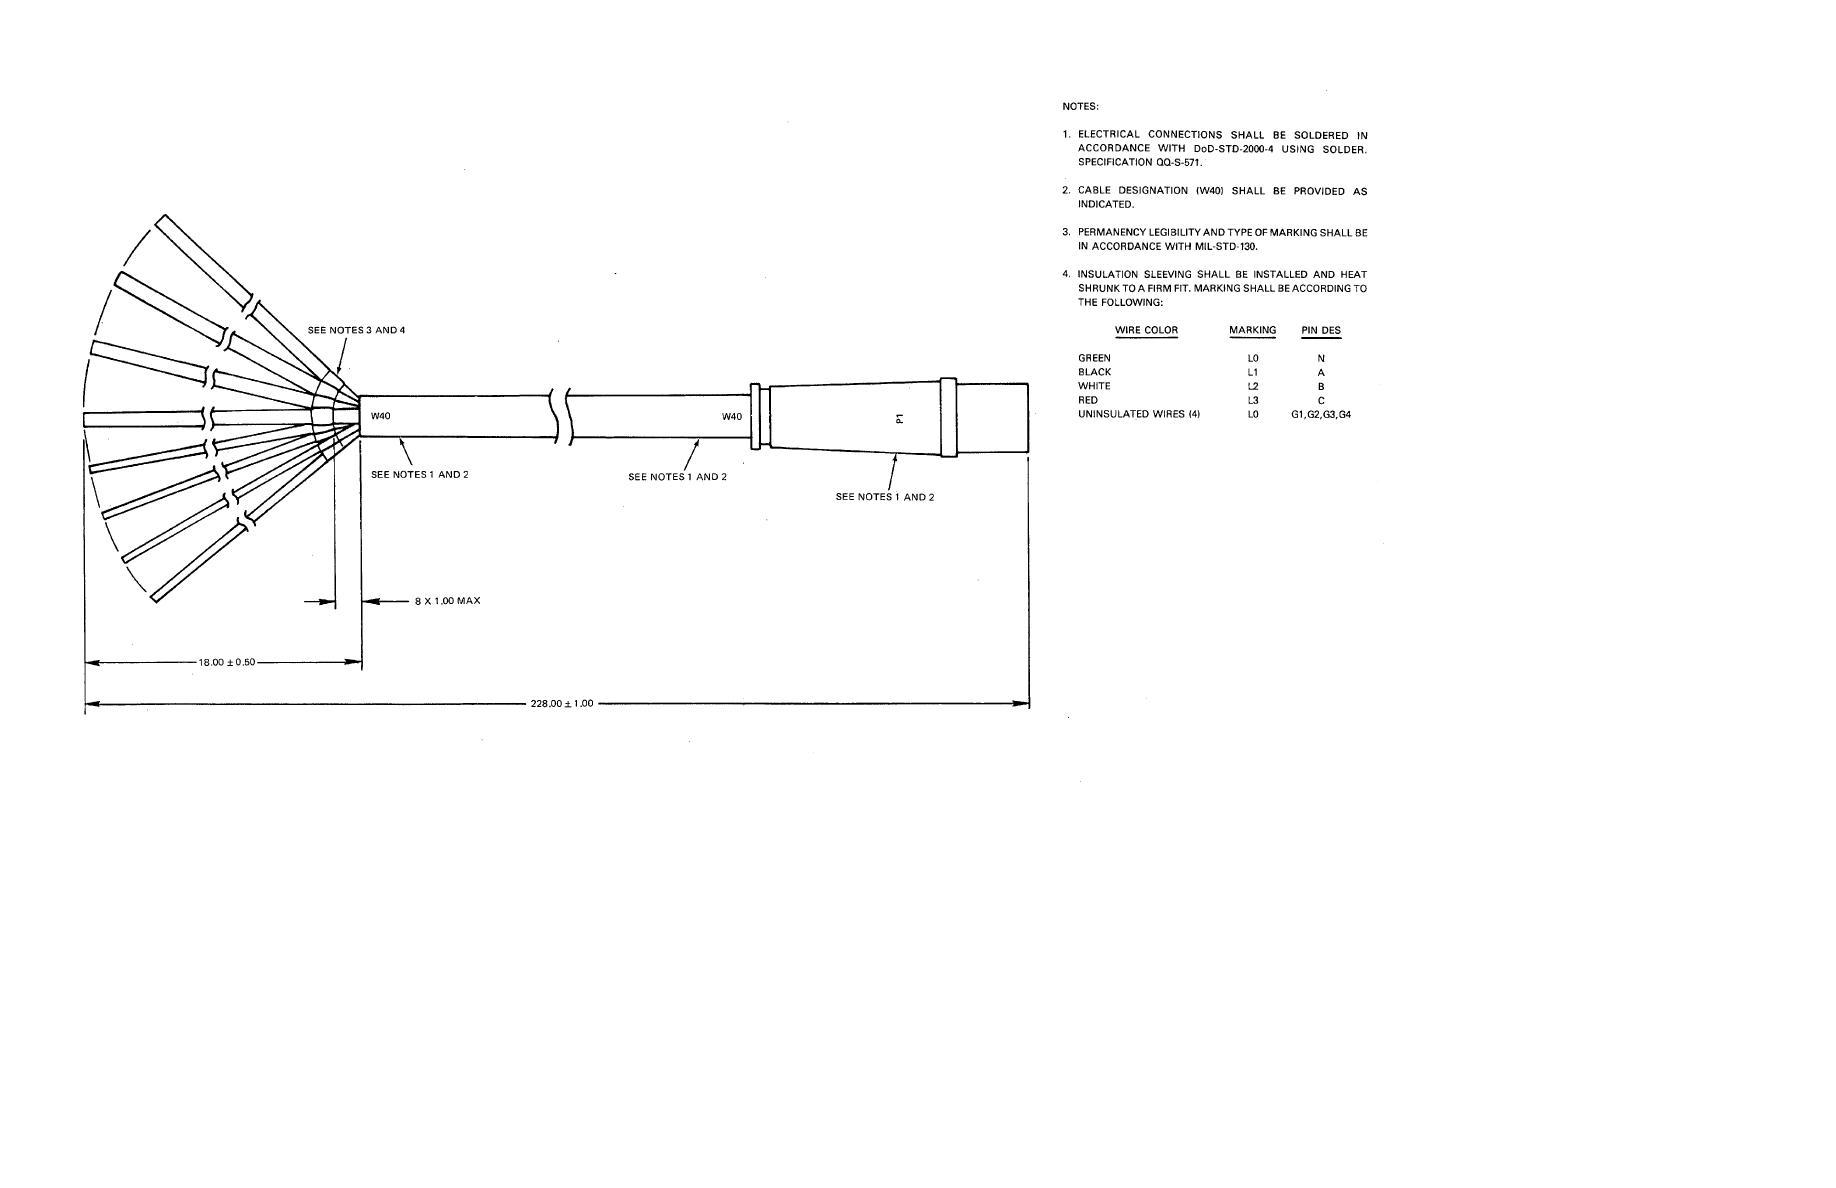 F0 13 Wiring Diagram Rowpu Power Cable W40 G1 Tm 10 4610 239 24